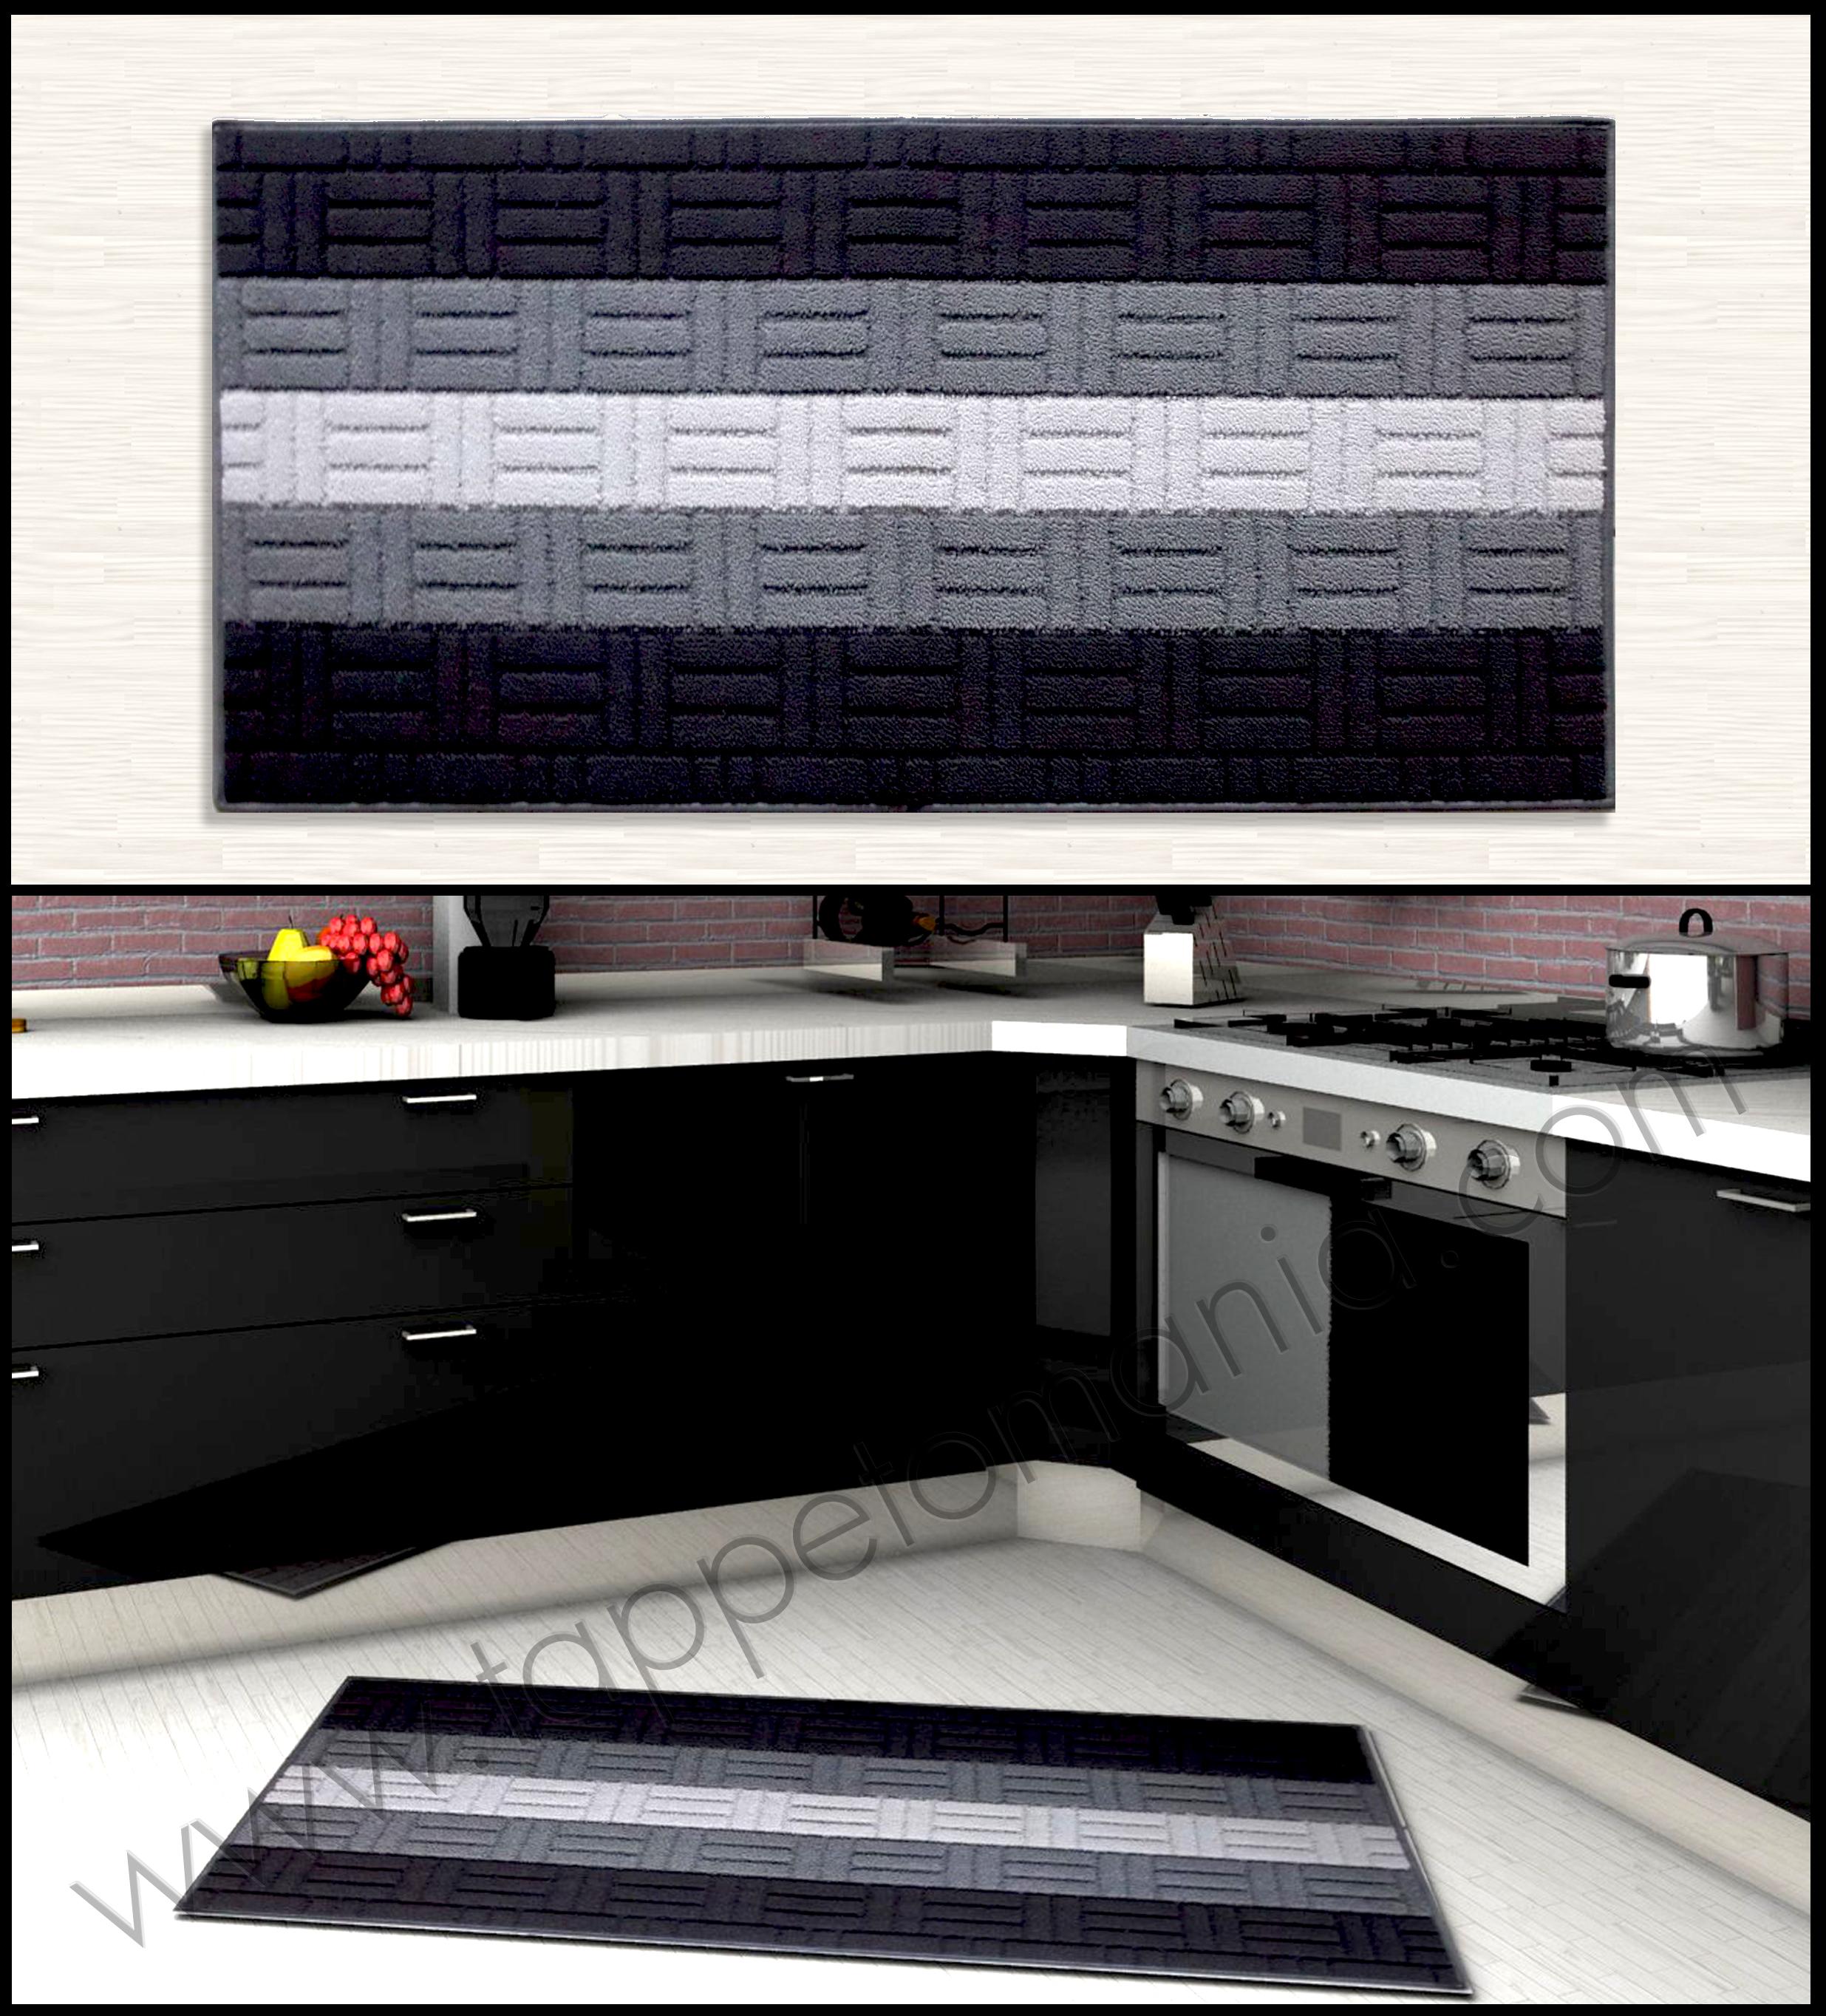 scopri i tappeti e i tessili shoppinland: grande qualità a prezzi ... - Cucine Moderne Prezzi Bassi